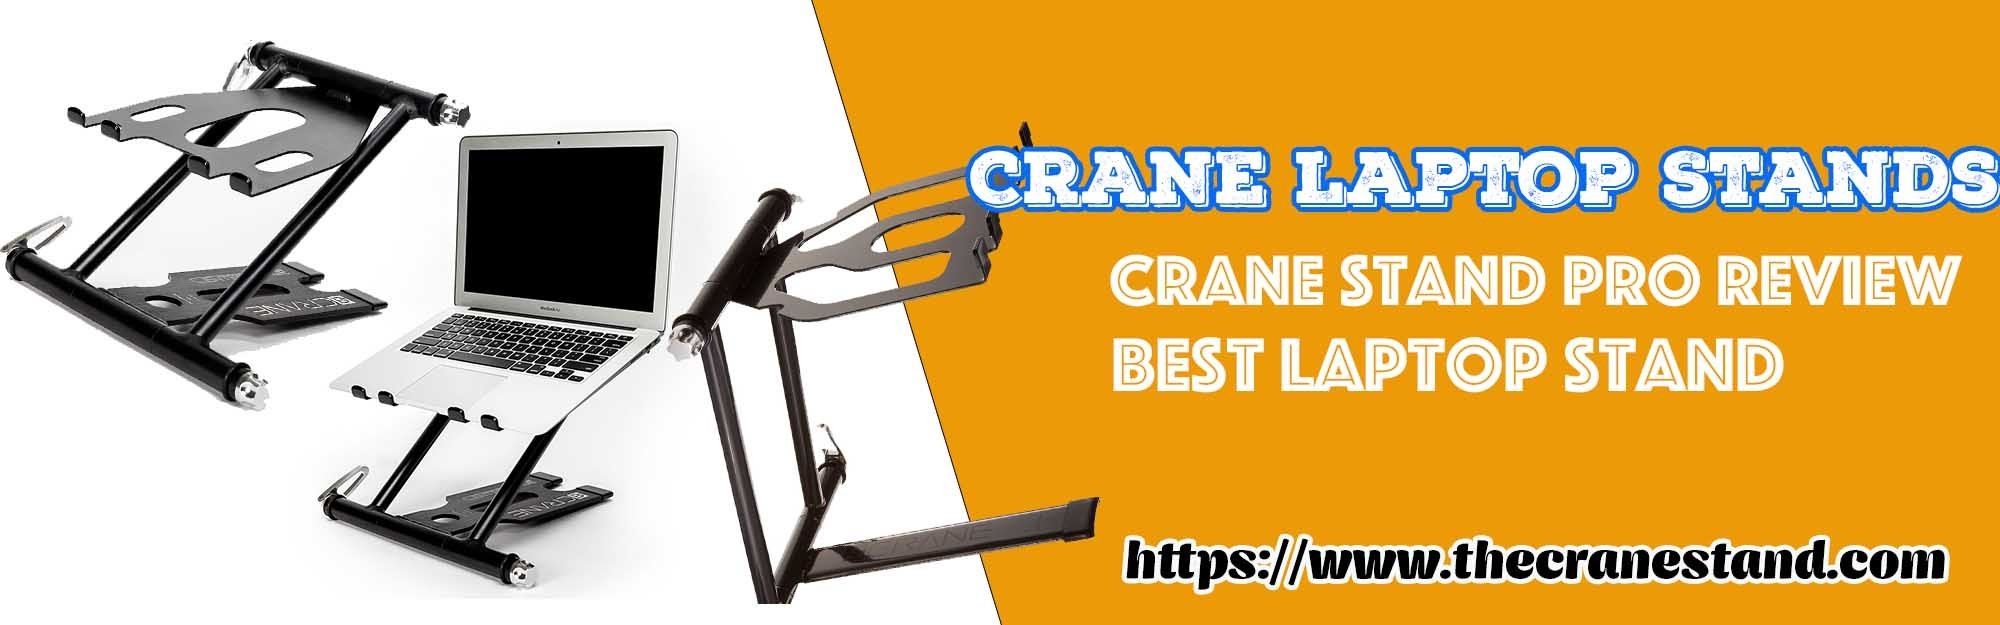 Crane Laptop Stands (@cranestandplus) Cover Image